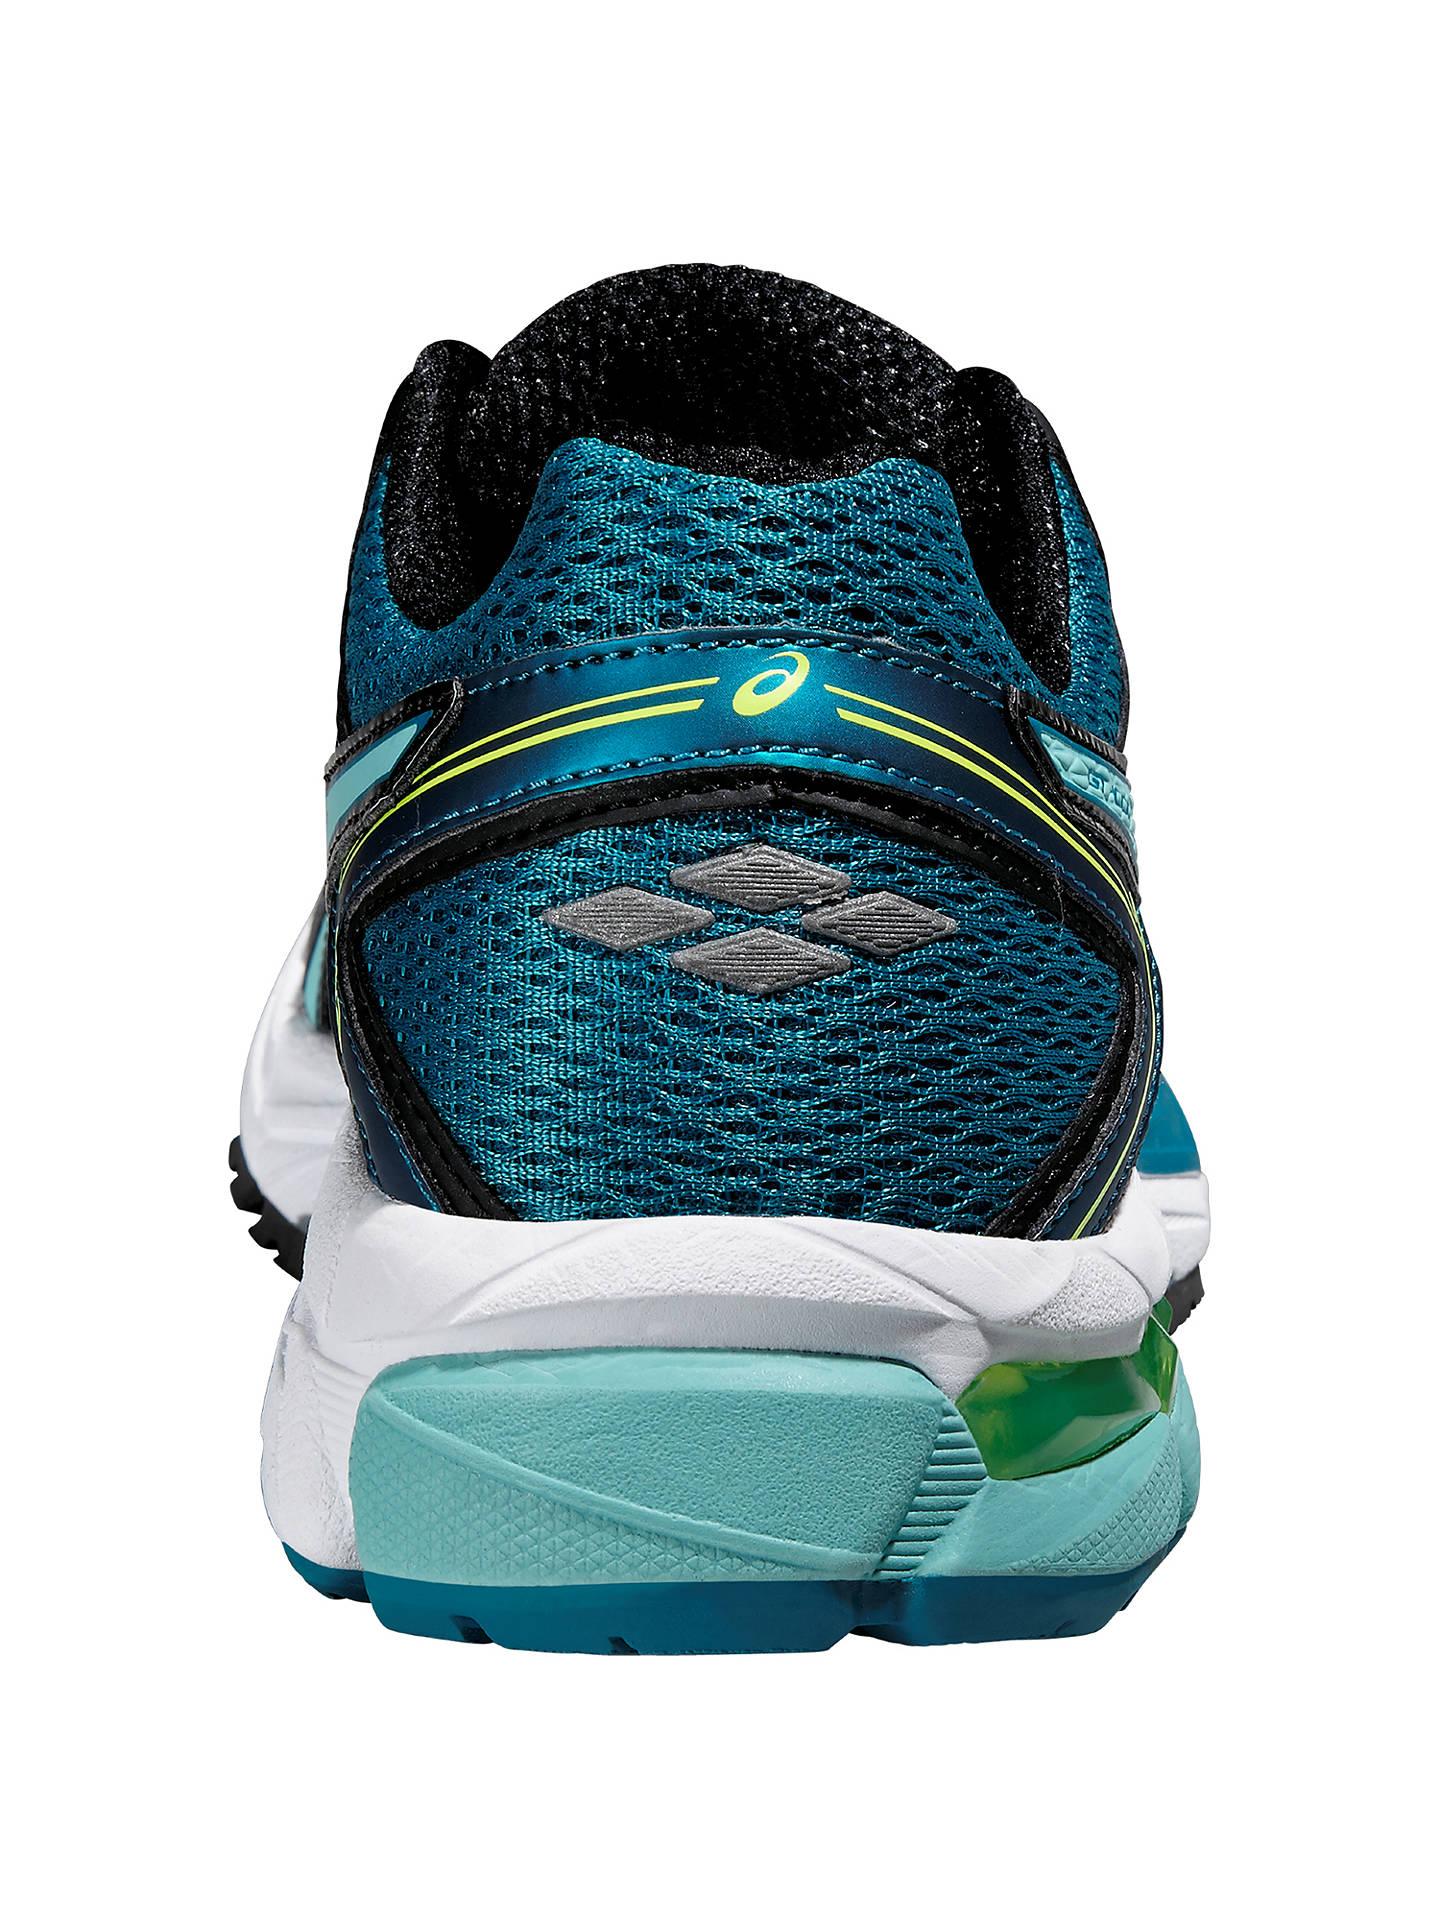 Doctrina Chimenea quemado  Asics GT-1000 4 Women's Structured Running Shoes, Black/Blue at John Lewis  & Partners